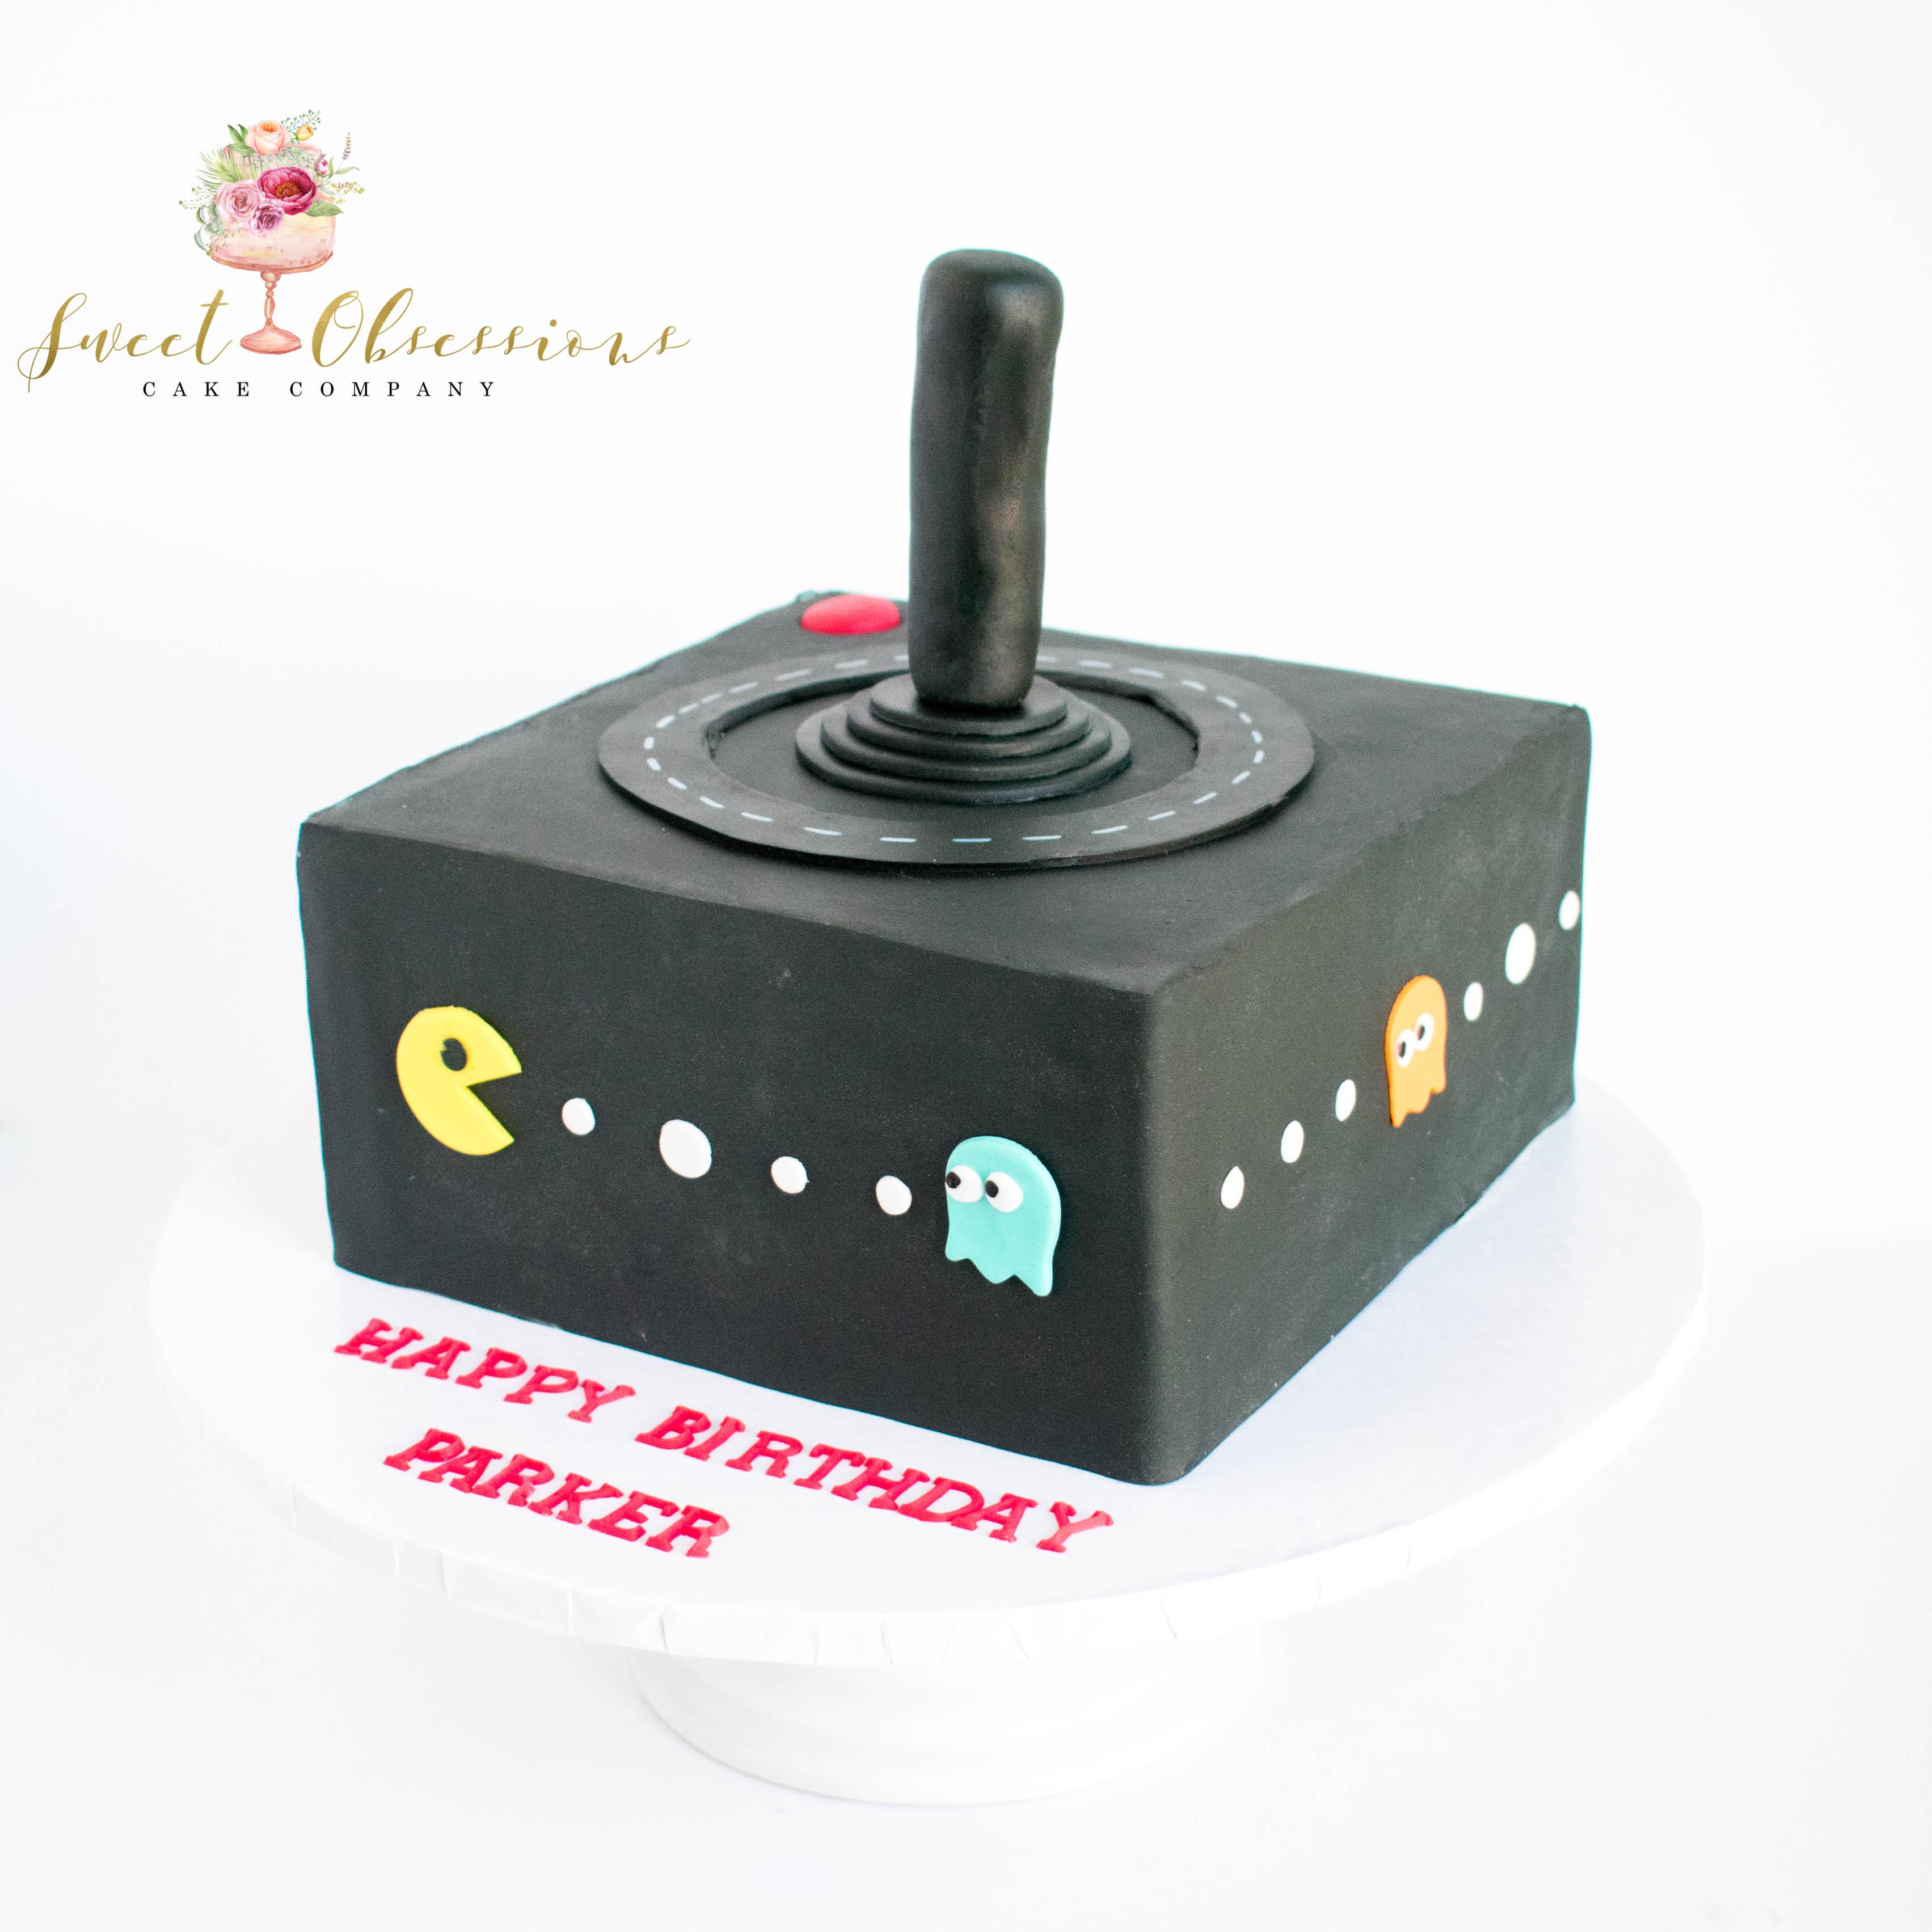 Atari Cake